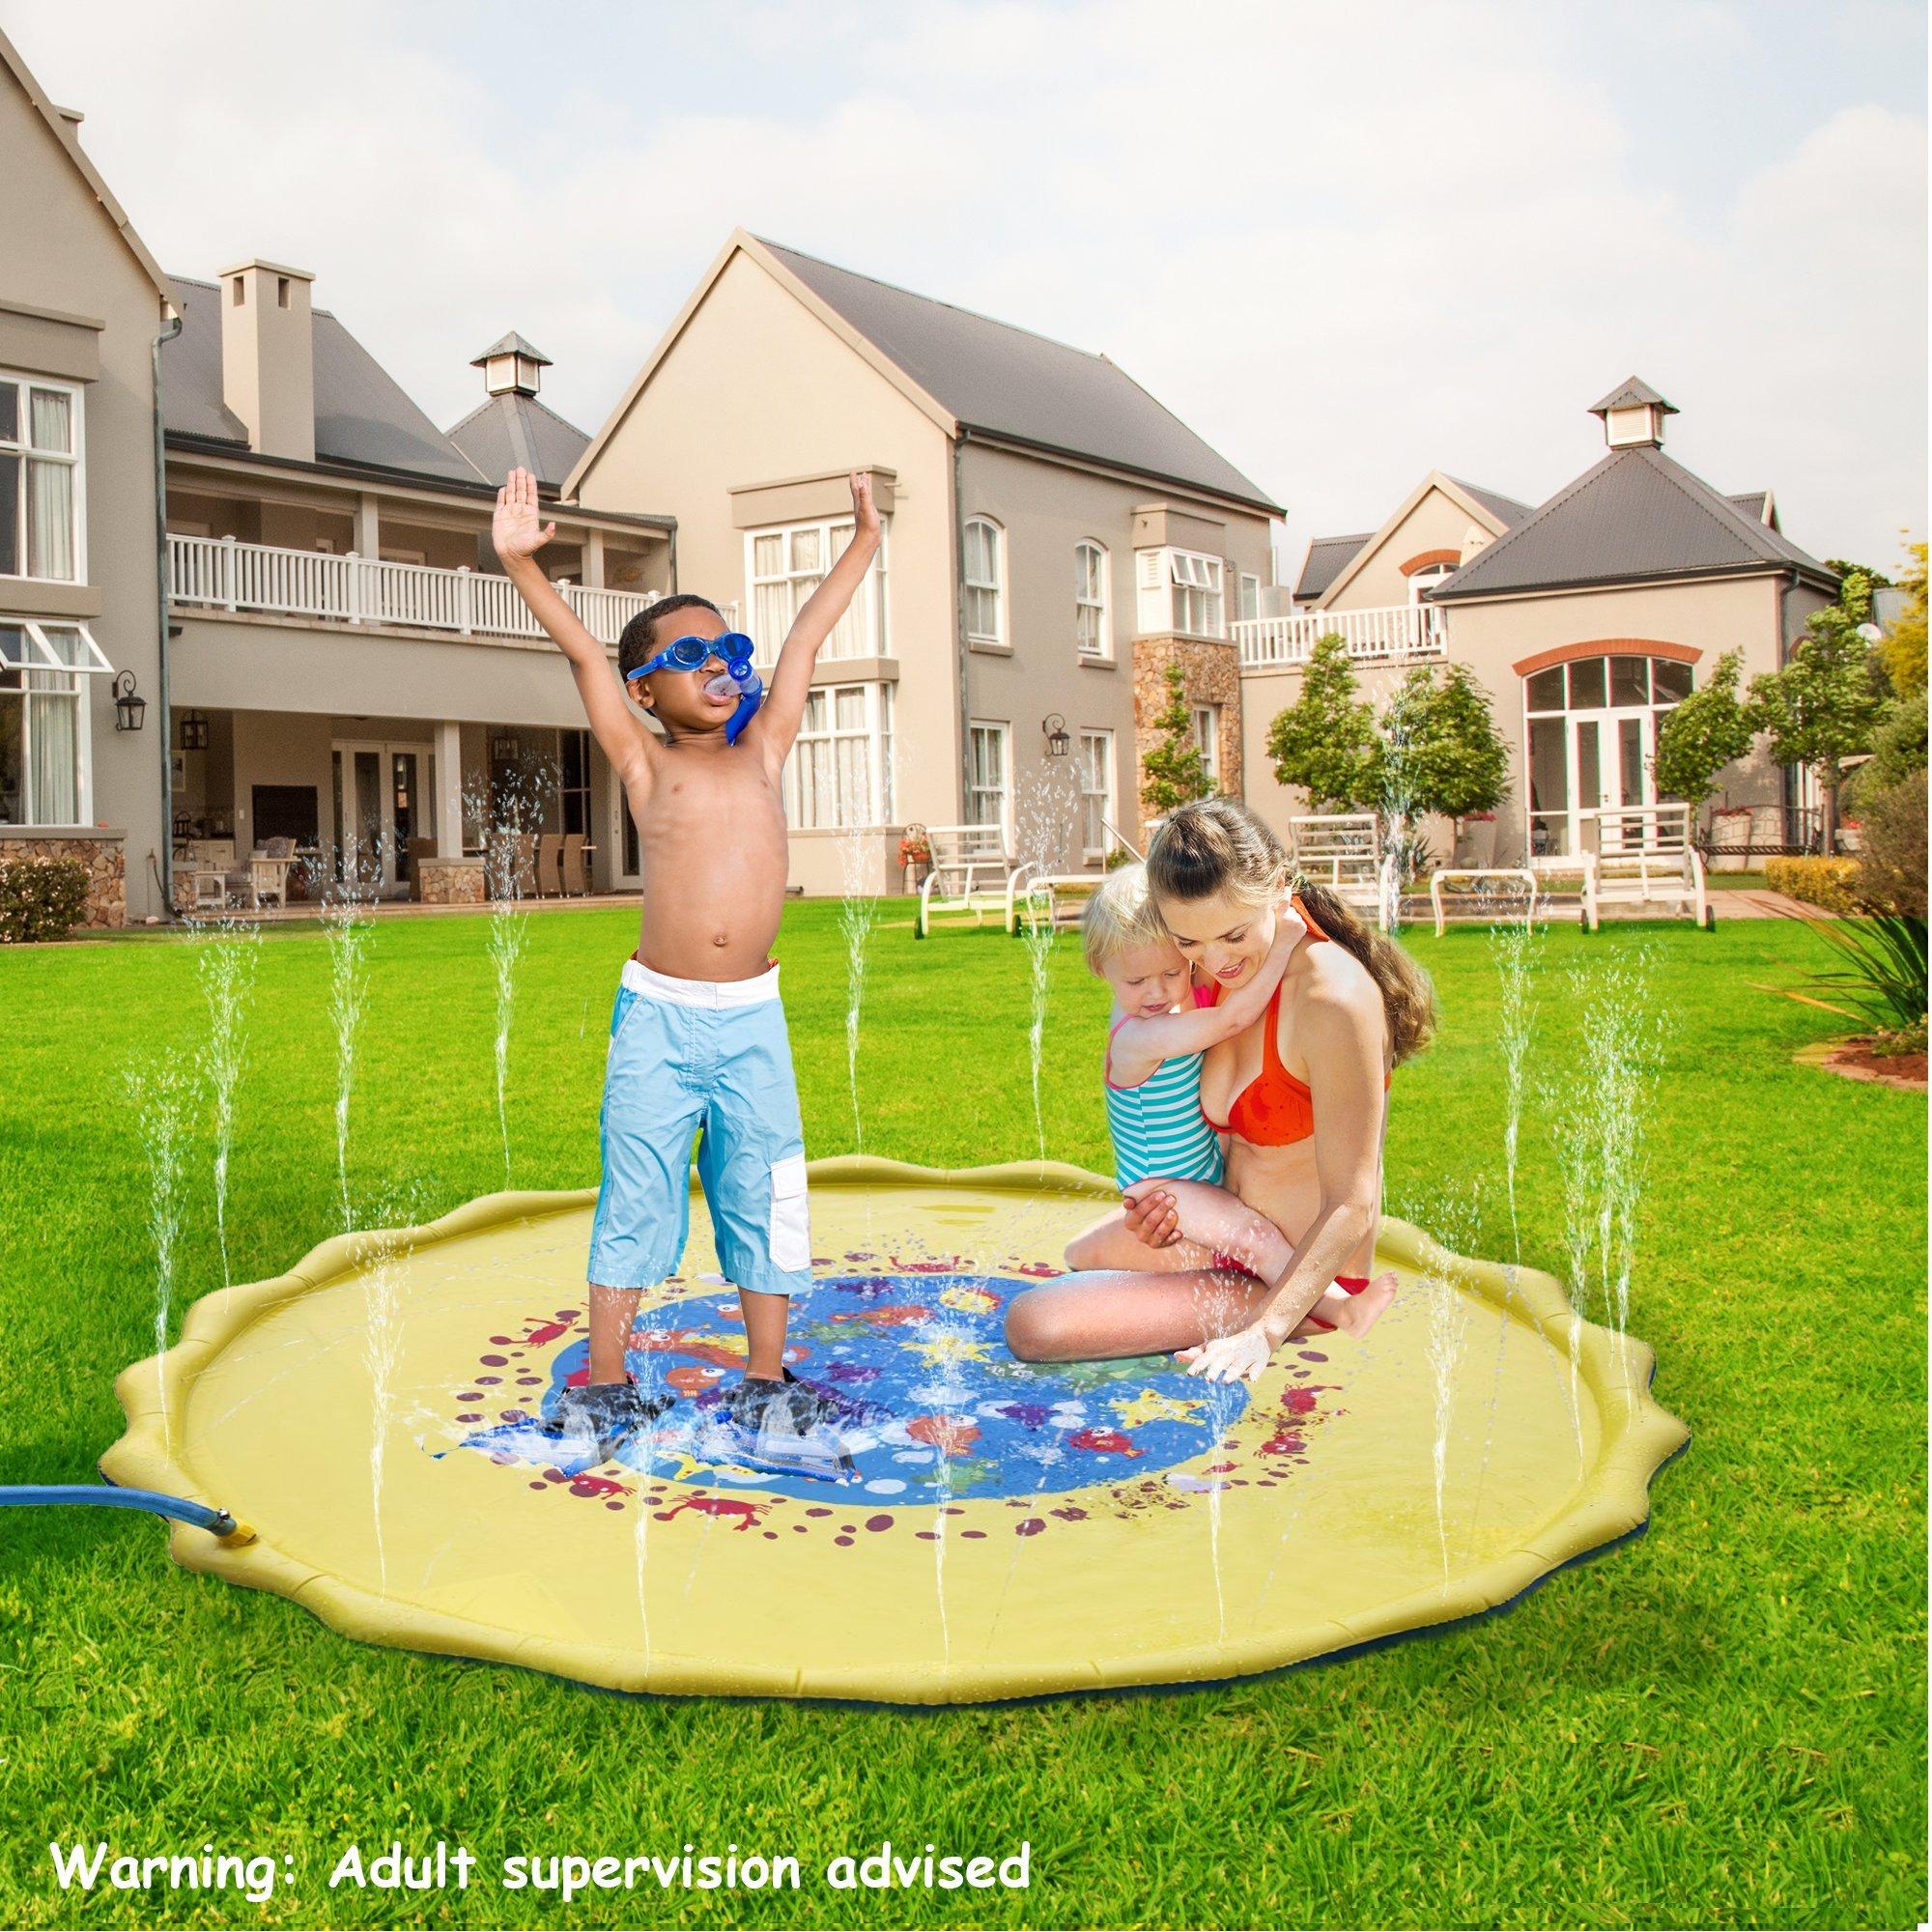 Hoovy Baby Water Splash Mat   68'' Large Diameter Inflatable Outdoor Sprinkler Pad For The Beach, Pool, Garden, Deck, Backyard, Summer & More